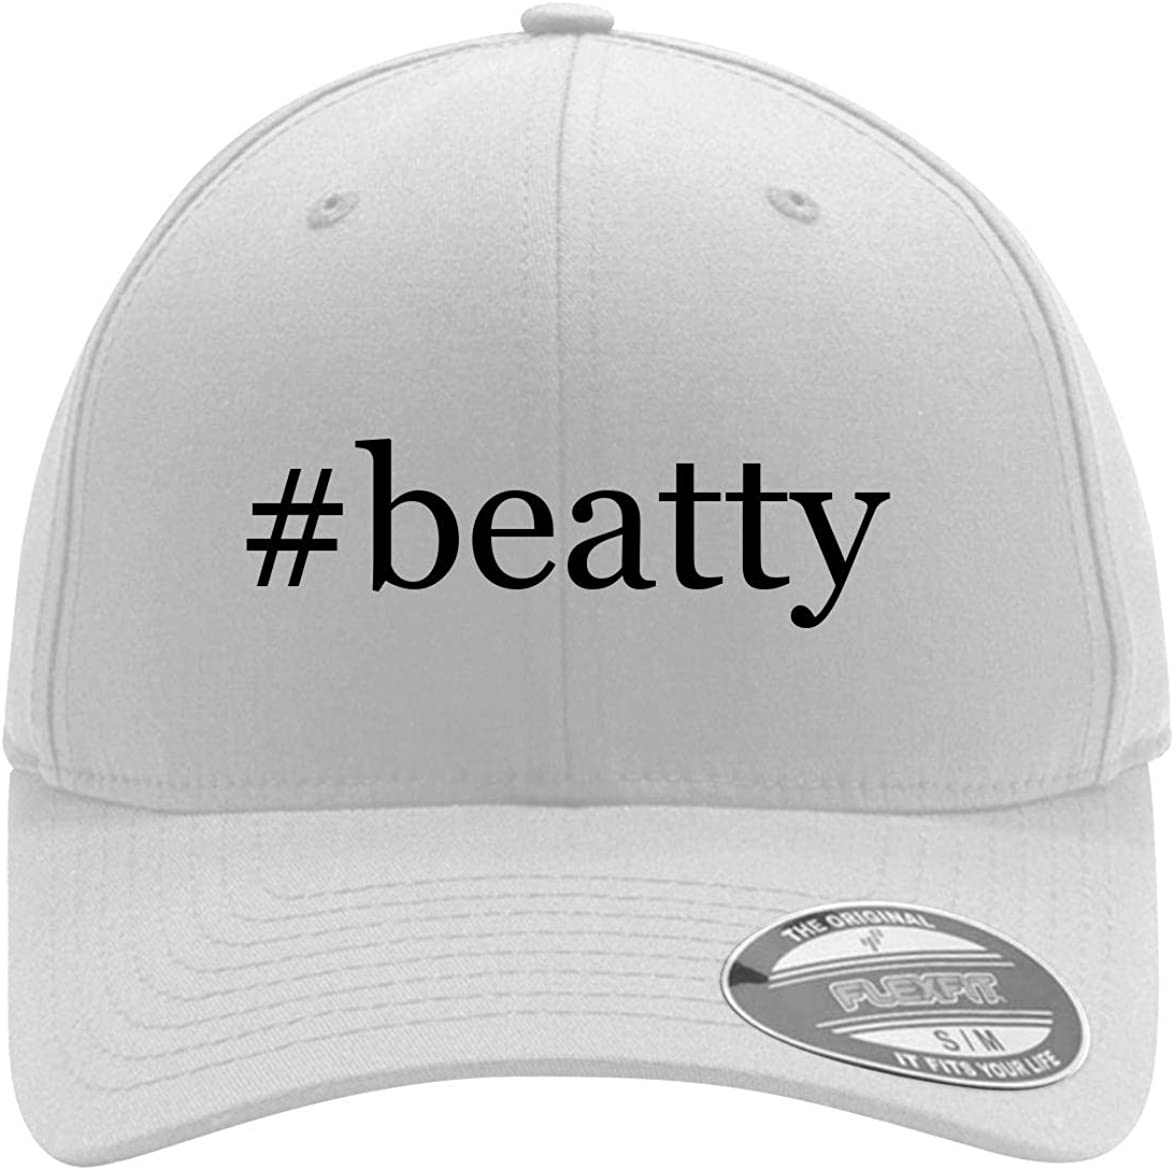 #beatty - Adult Men's Hashtag Flexfit Baseball Hat Cap